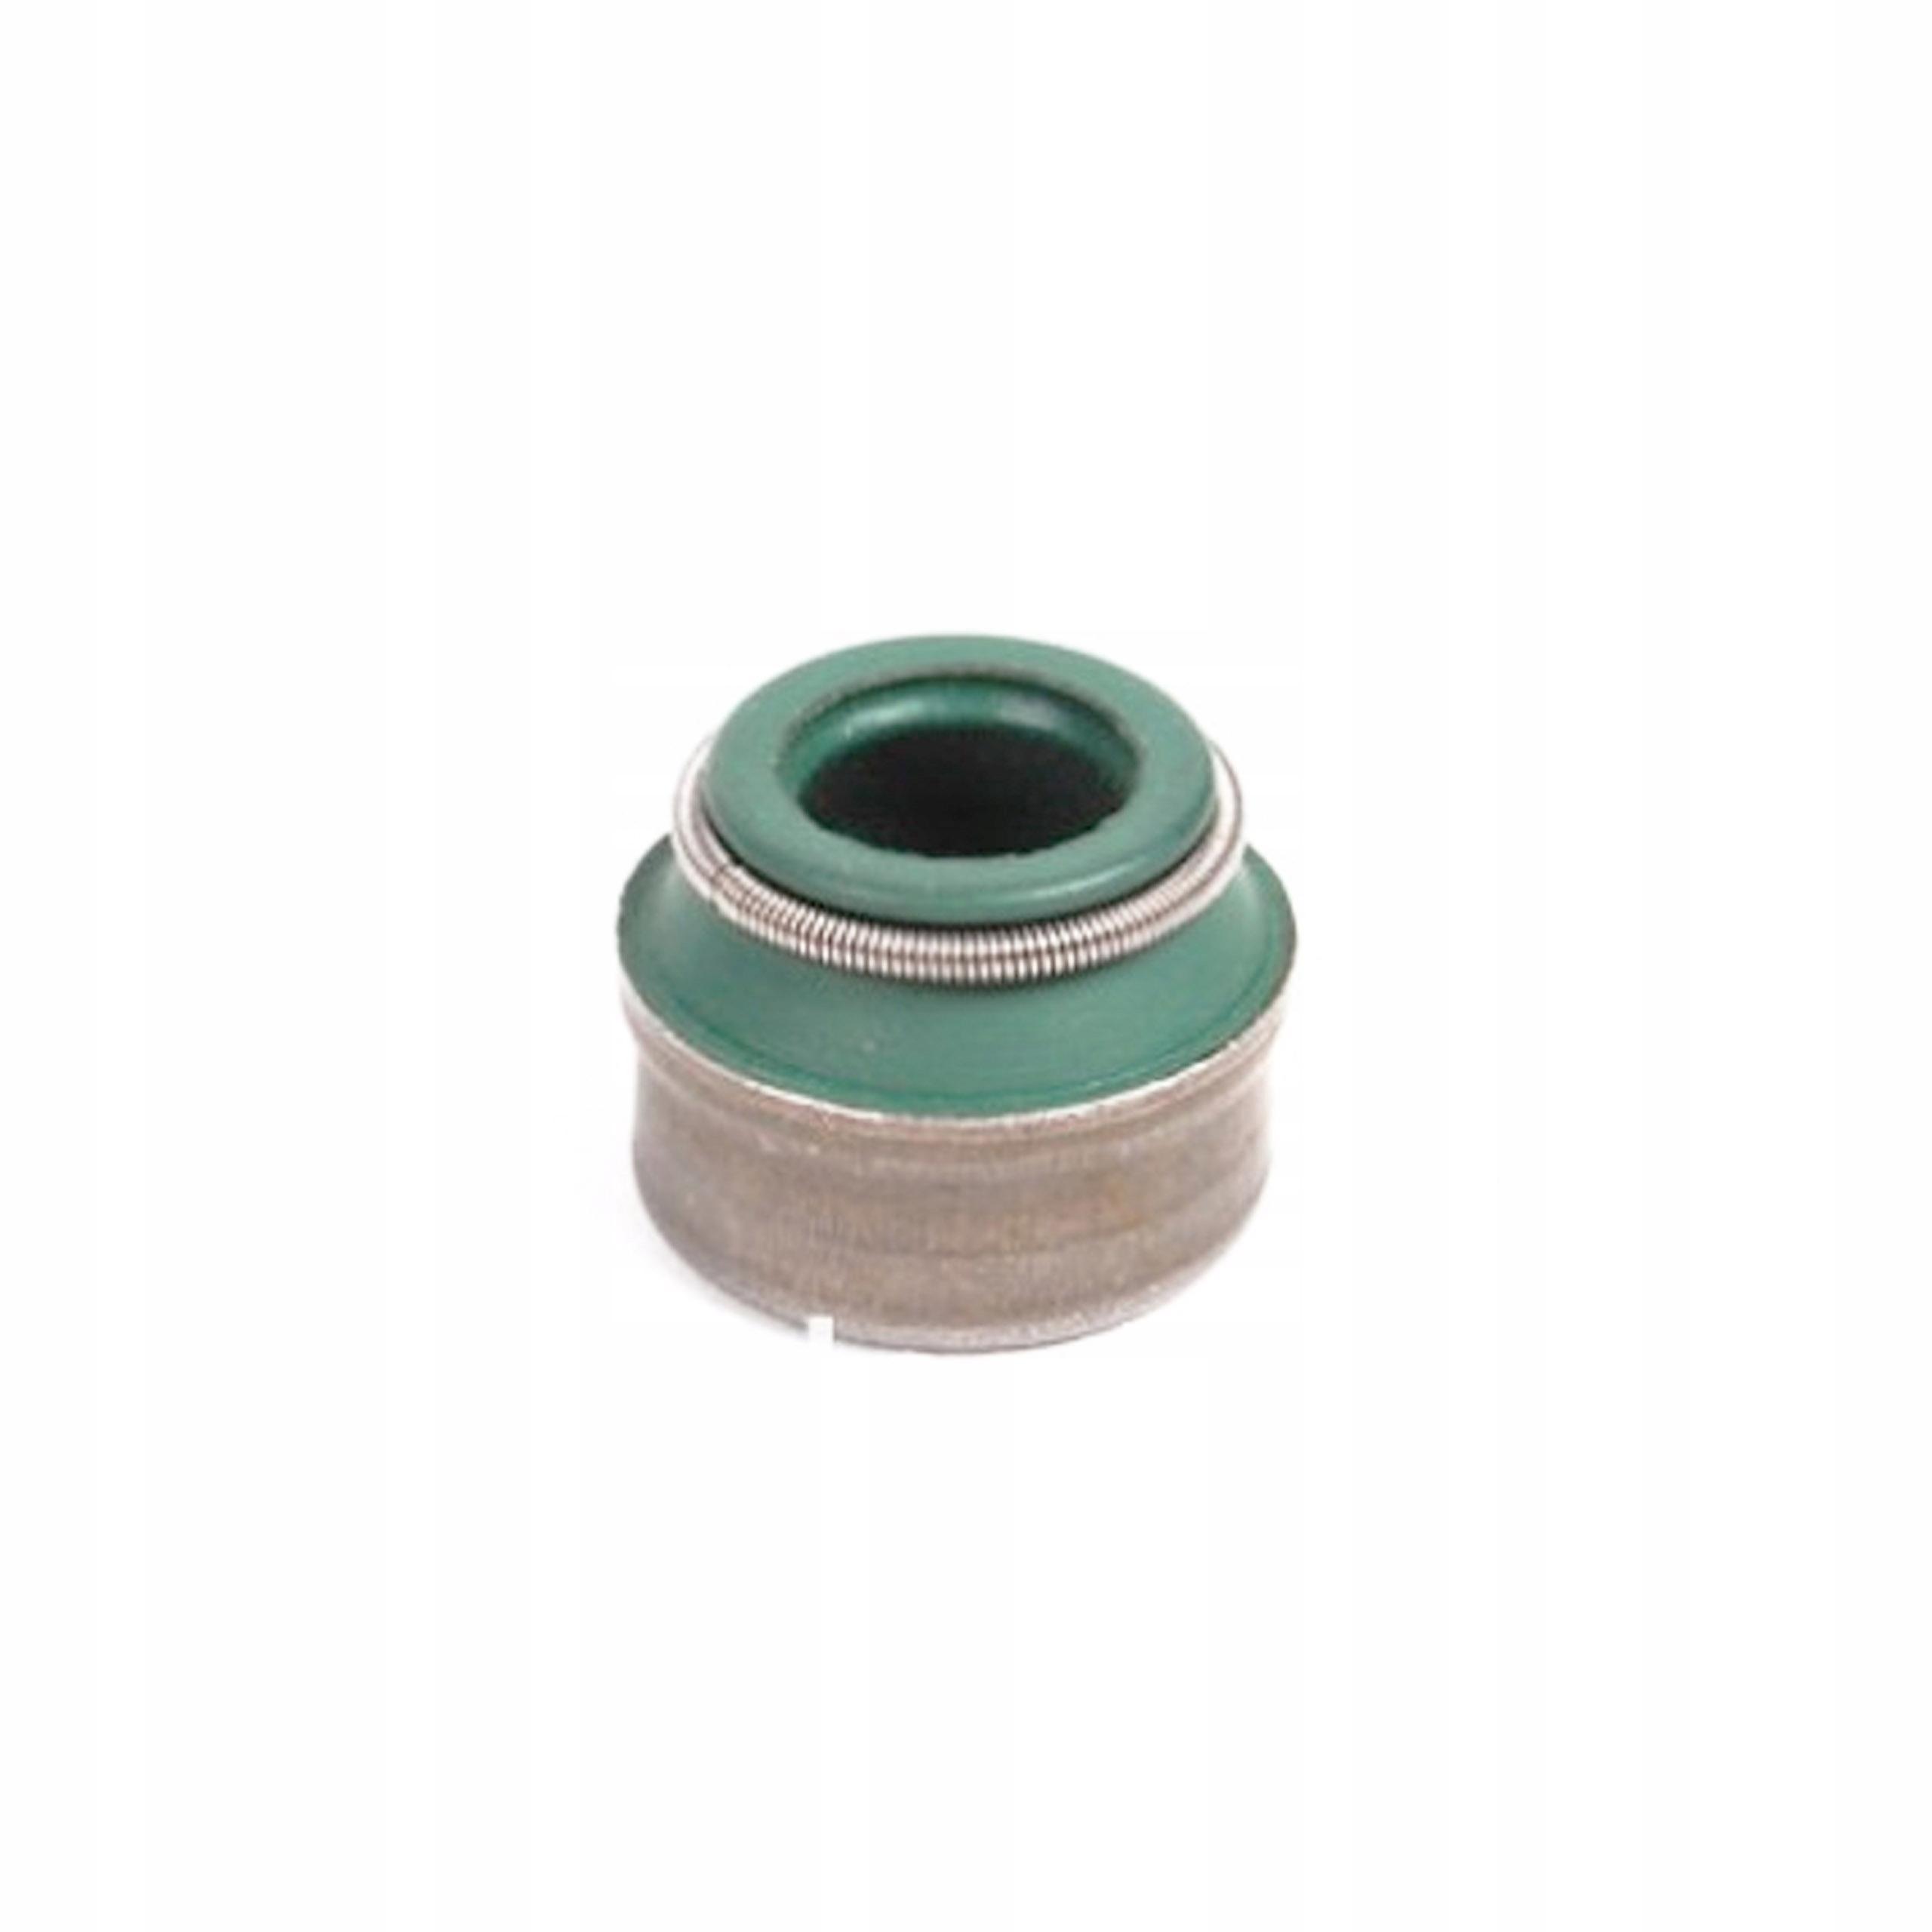 герметик стержня клапана reinz 70-26058-00